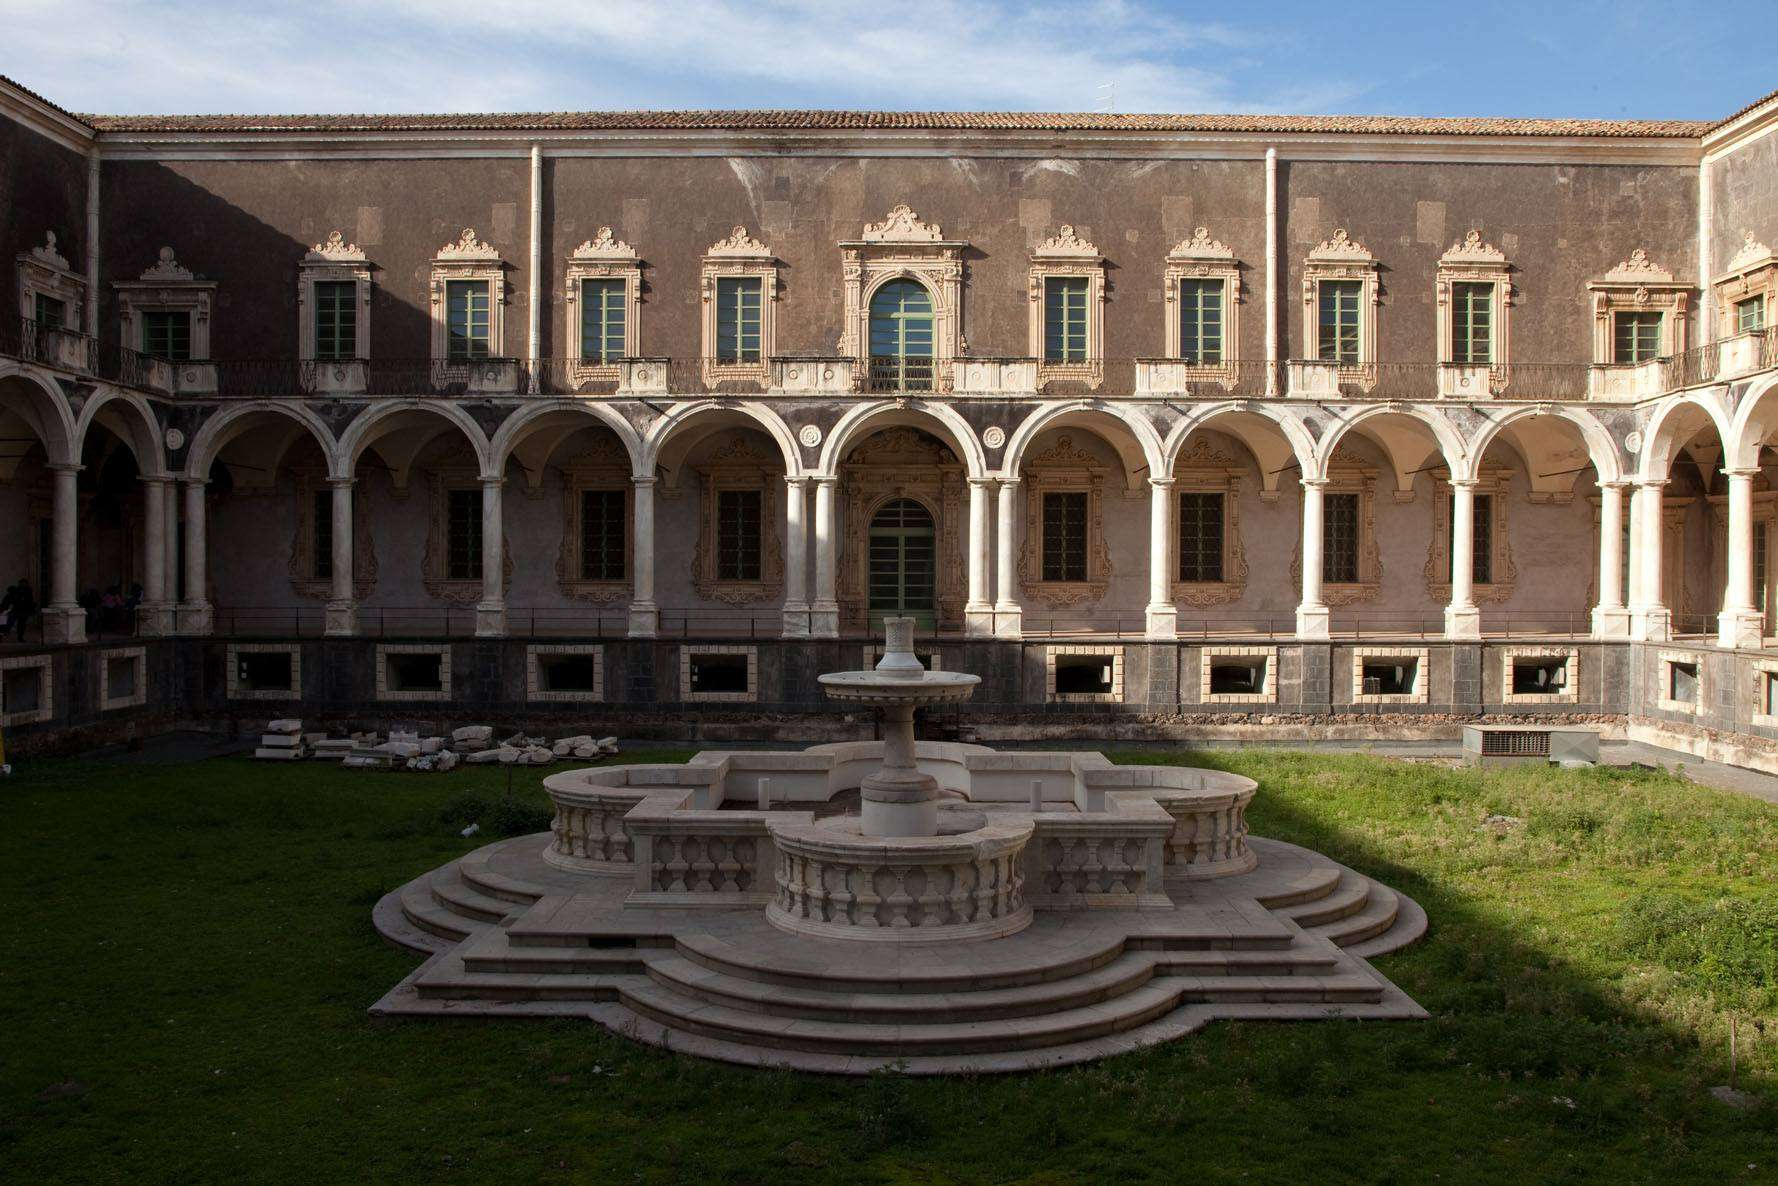 monastero-benedettini-catania